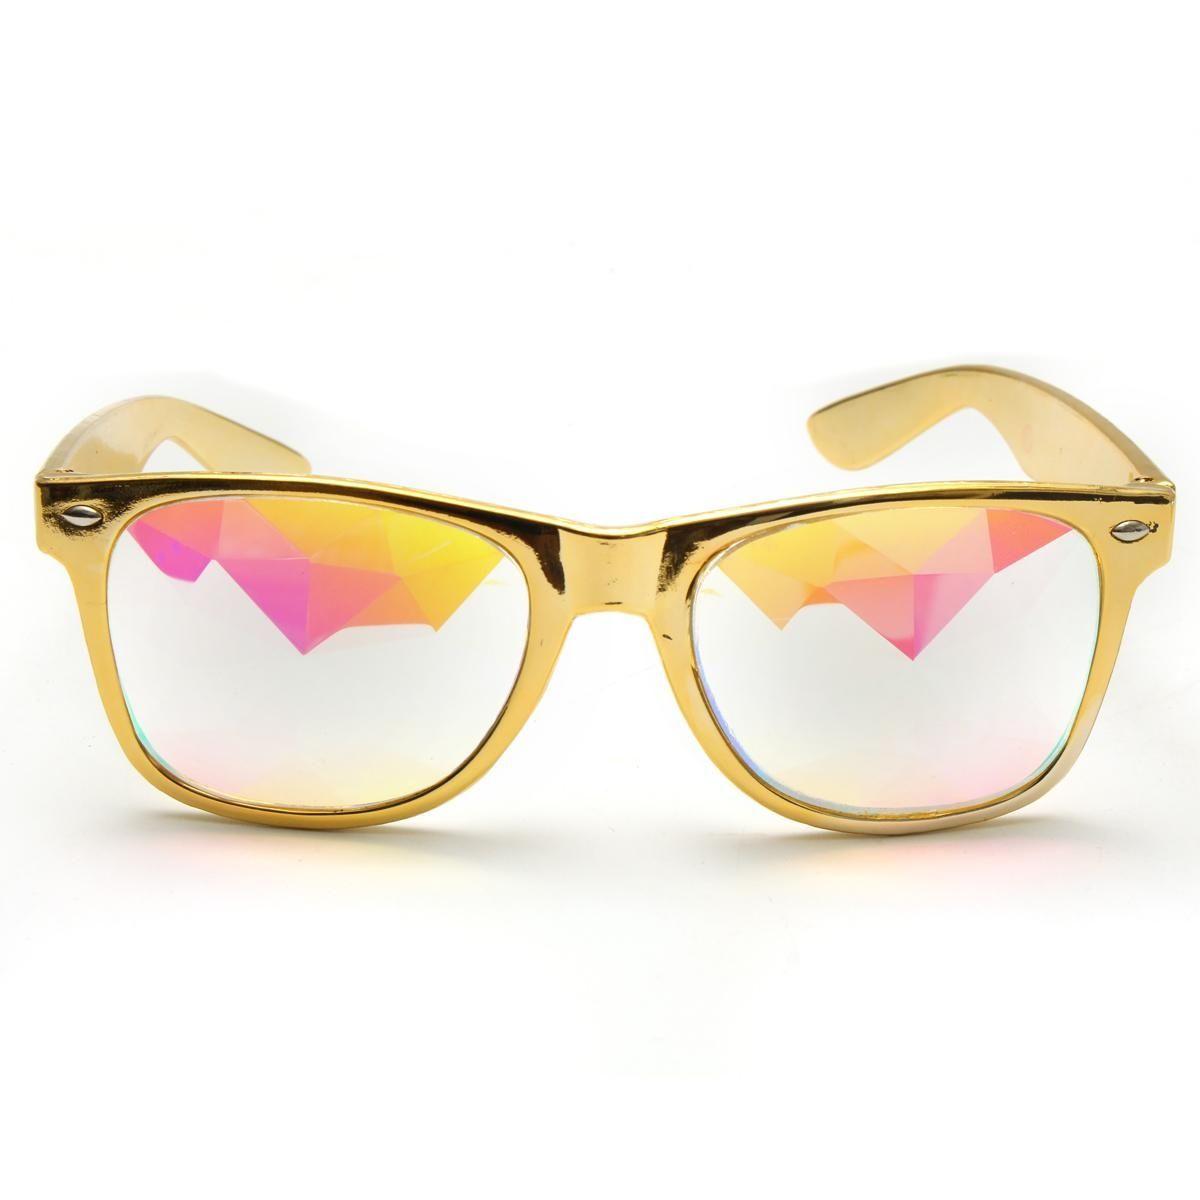 e4f95f88f5b Buy Generic Kaleidoscope Rave Glasses Diffracted Lens Rainbow Crystal  Glasses Sunglasses - Gold in Egypt